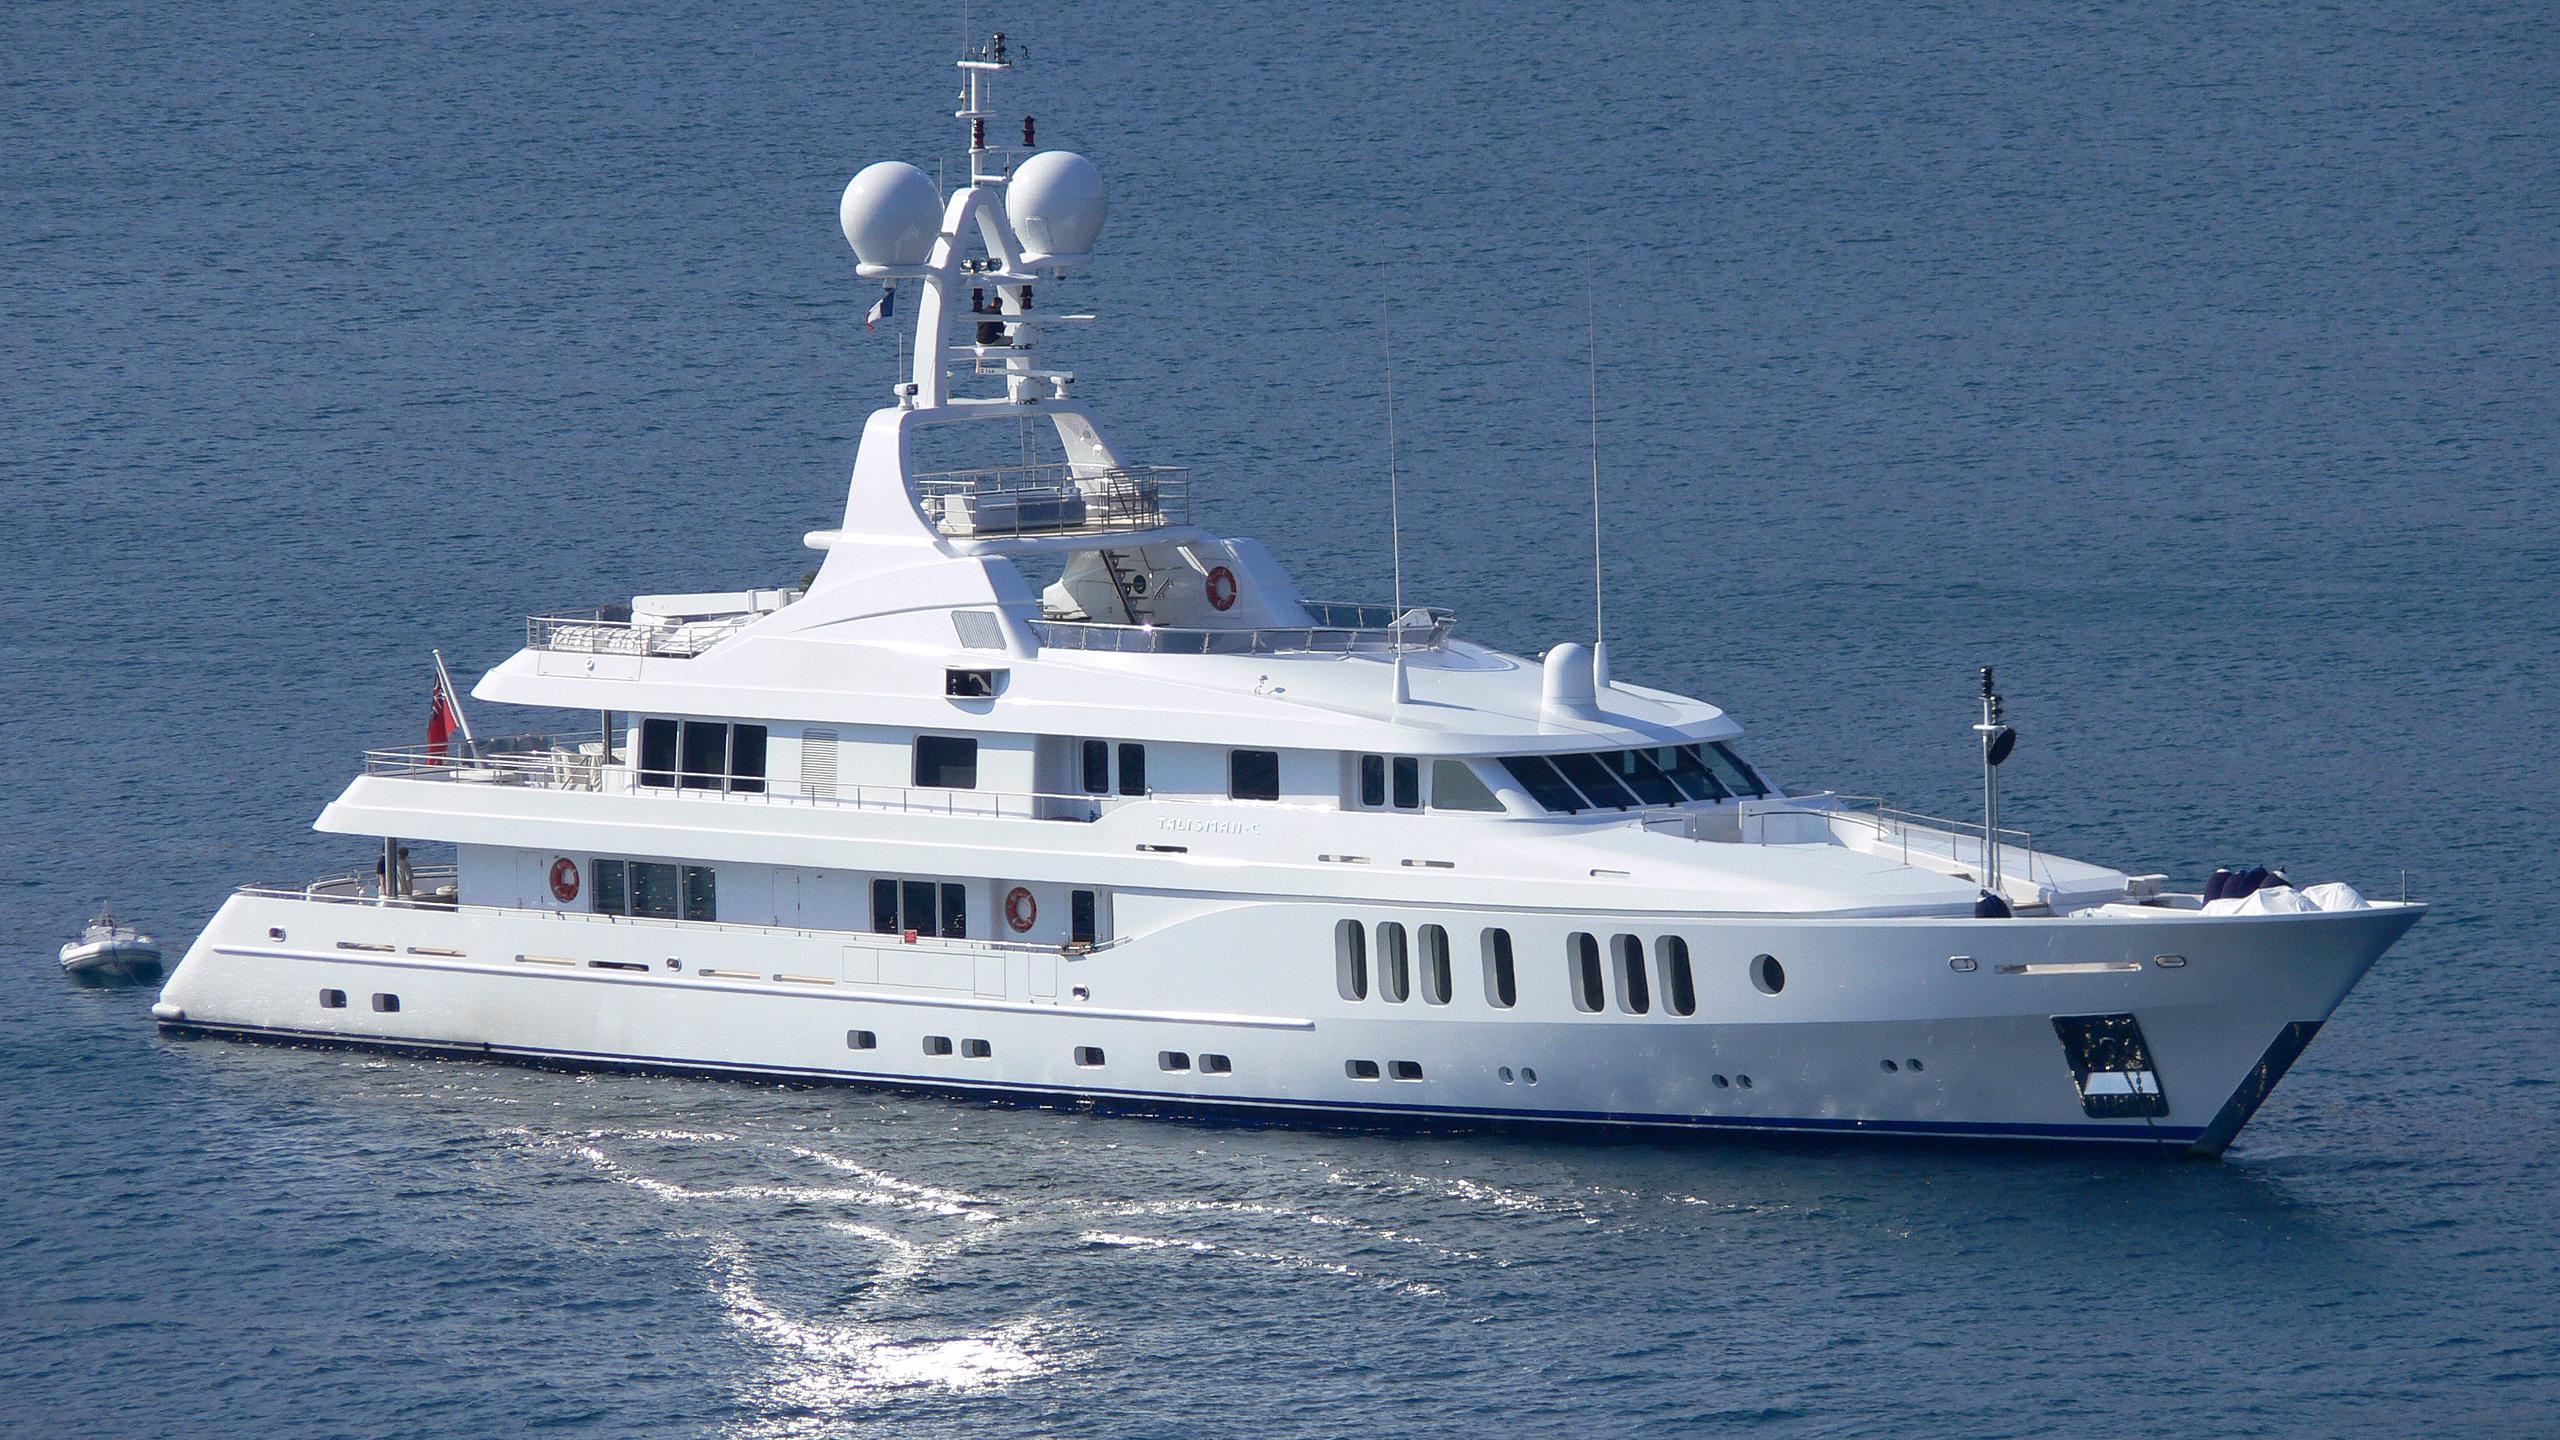 talisman-maiton-motor-yacht-turquoise-2006-54m-half-profile